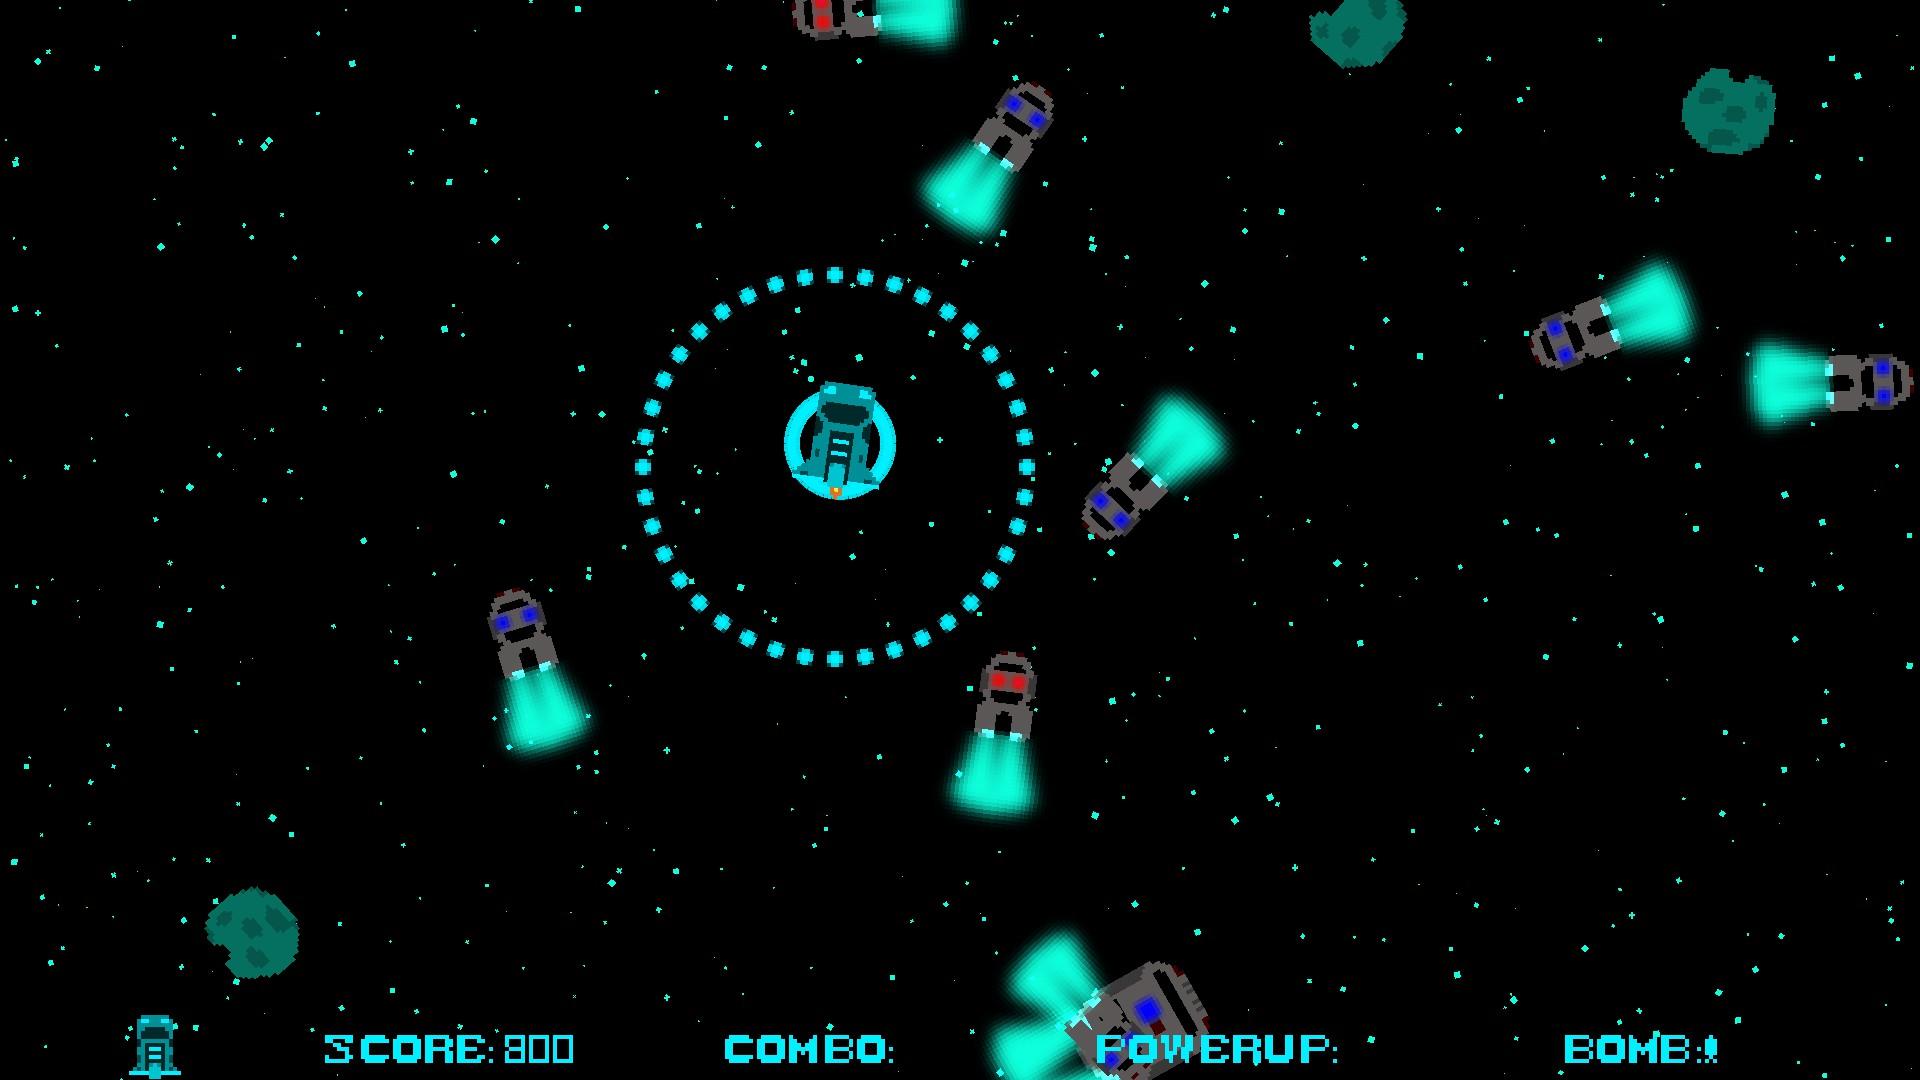 Cyberhunt screenshot